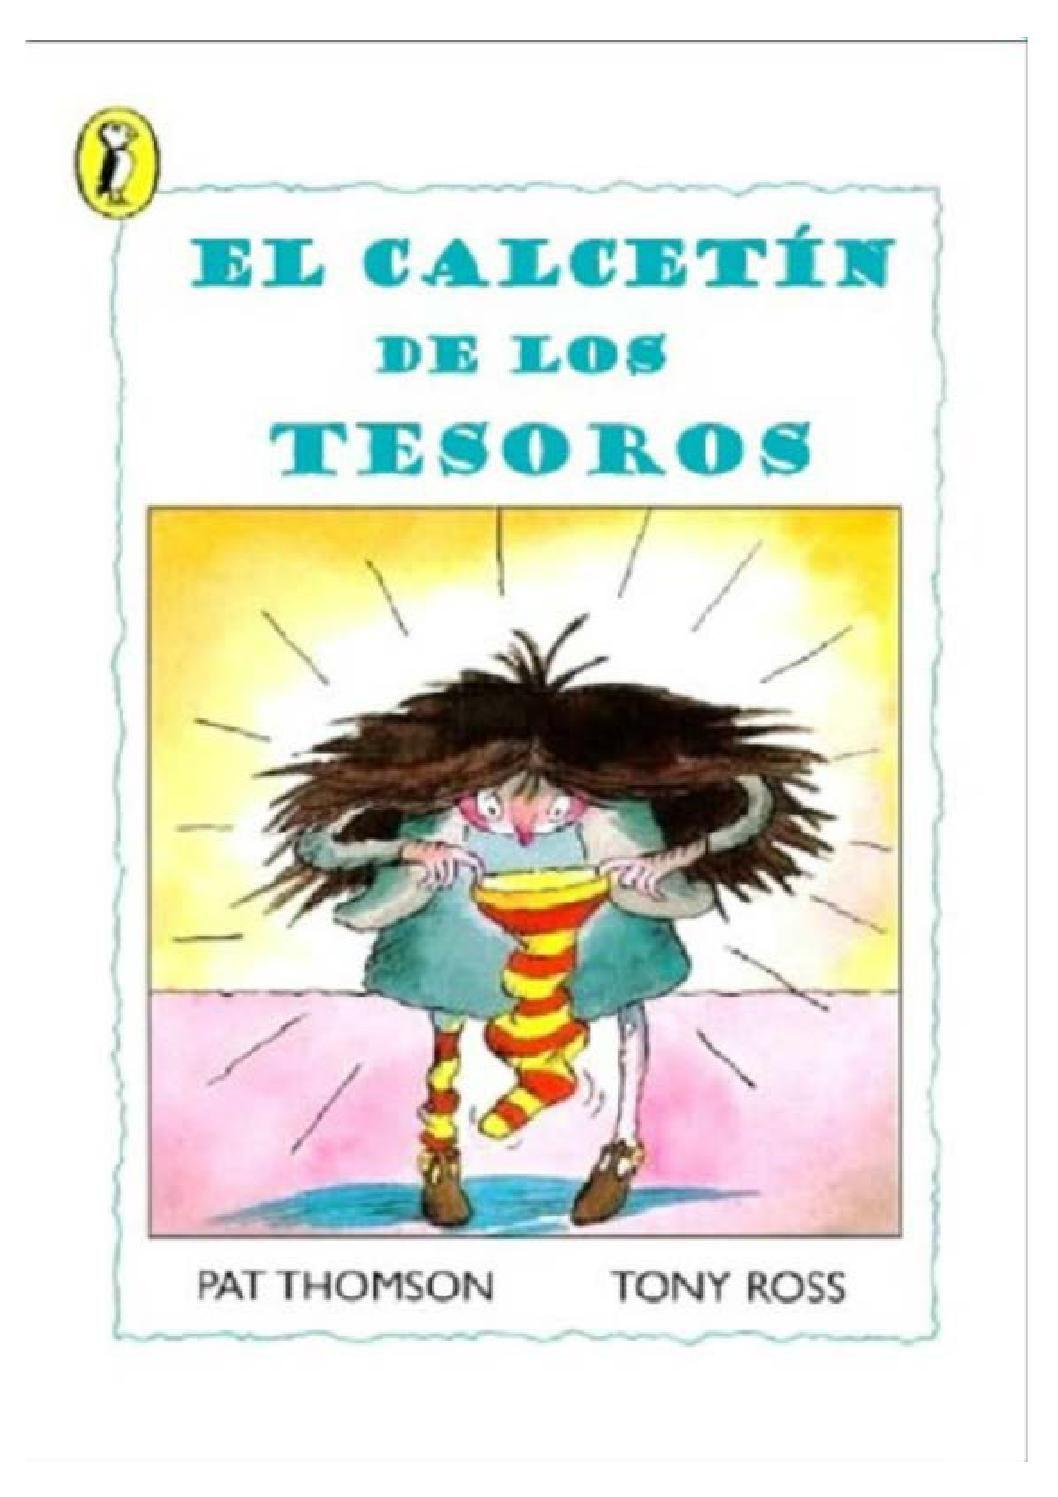 El Calcetín De Los Tesoros Comic Book Cover Comic Books Books